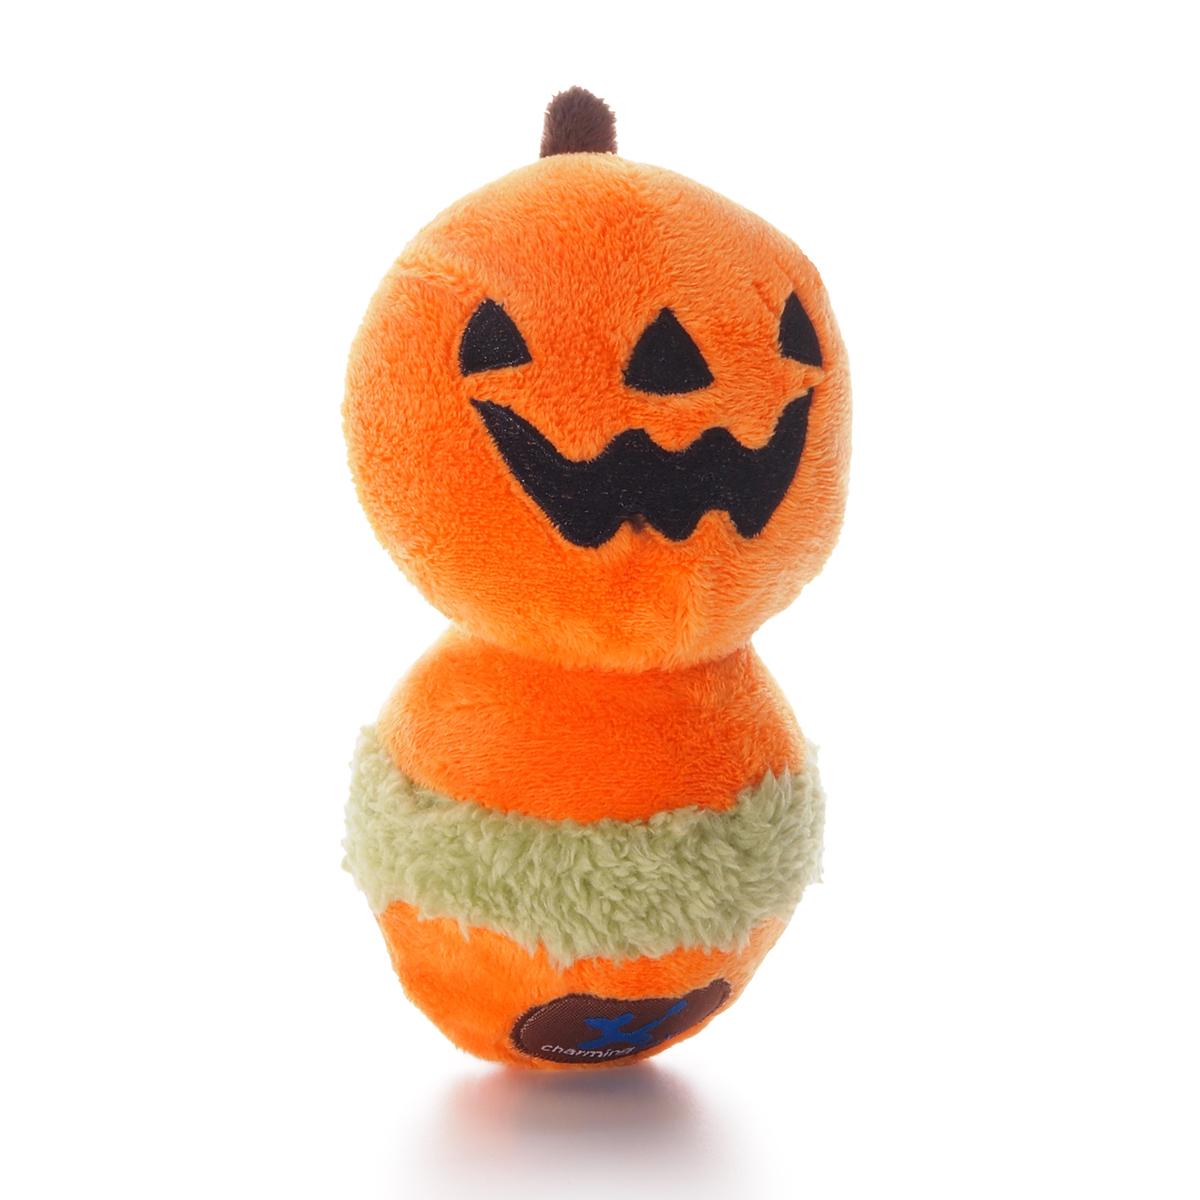 Wicked Wobblers Dog Toy - Pumpkin